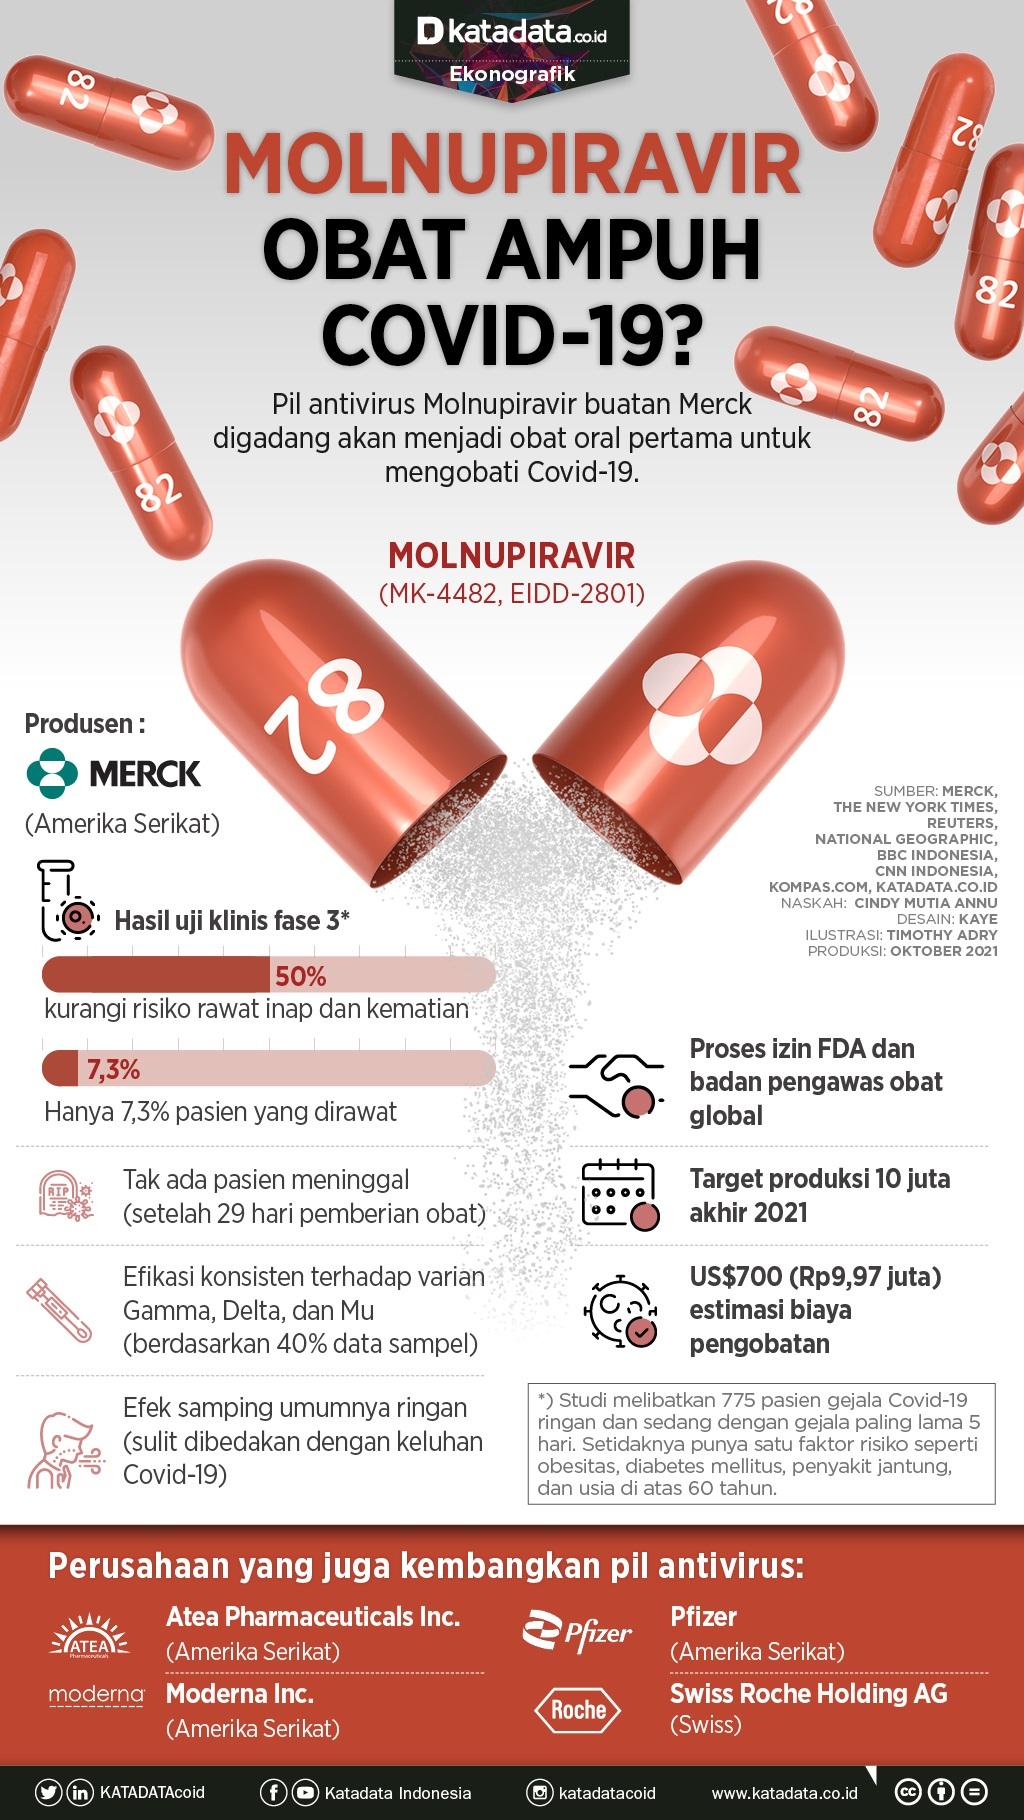 Infografik_Molnuviravir obat ampuh covid-19